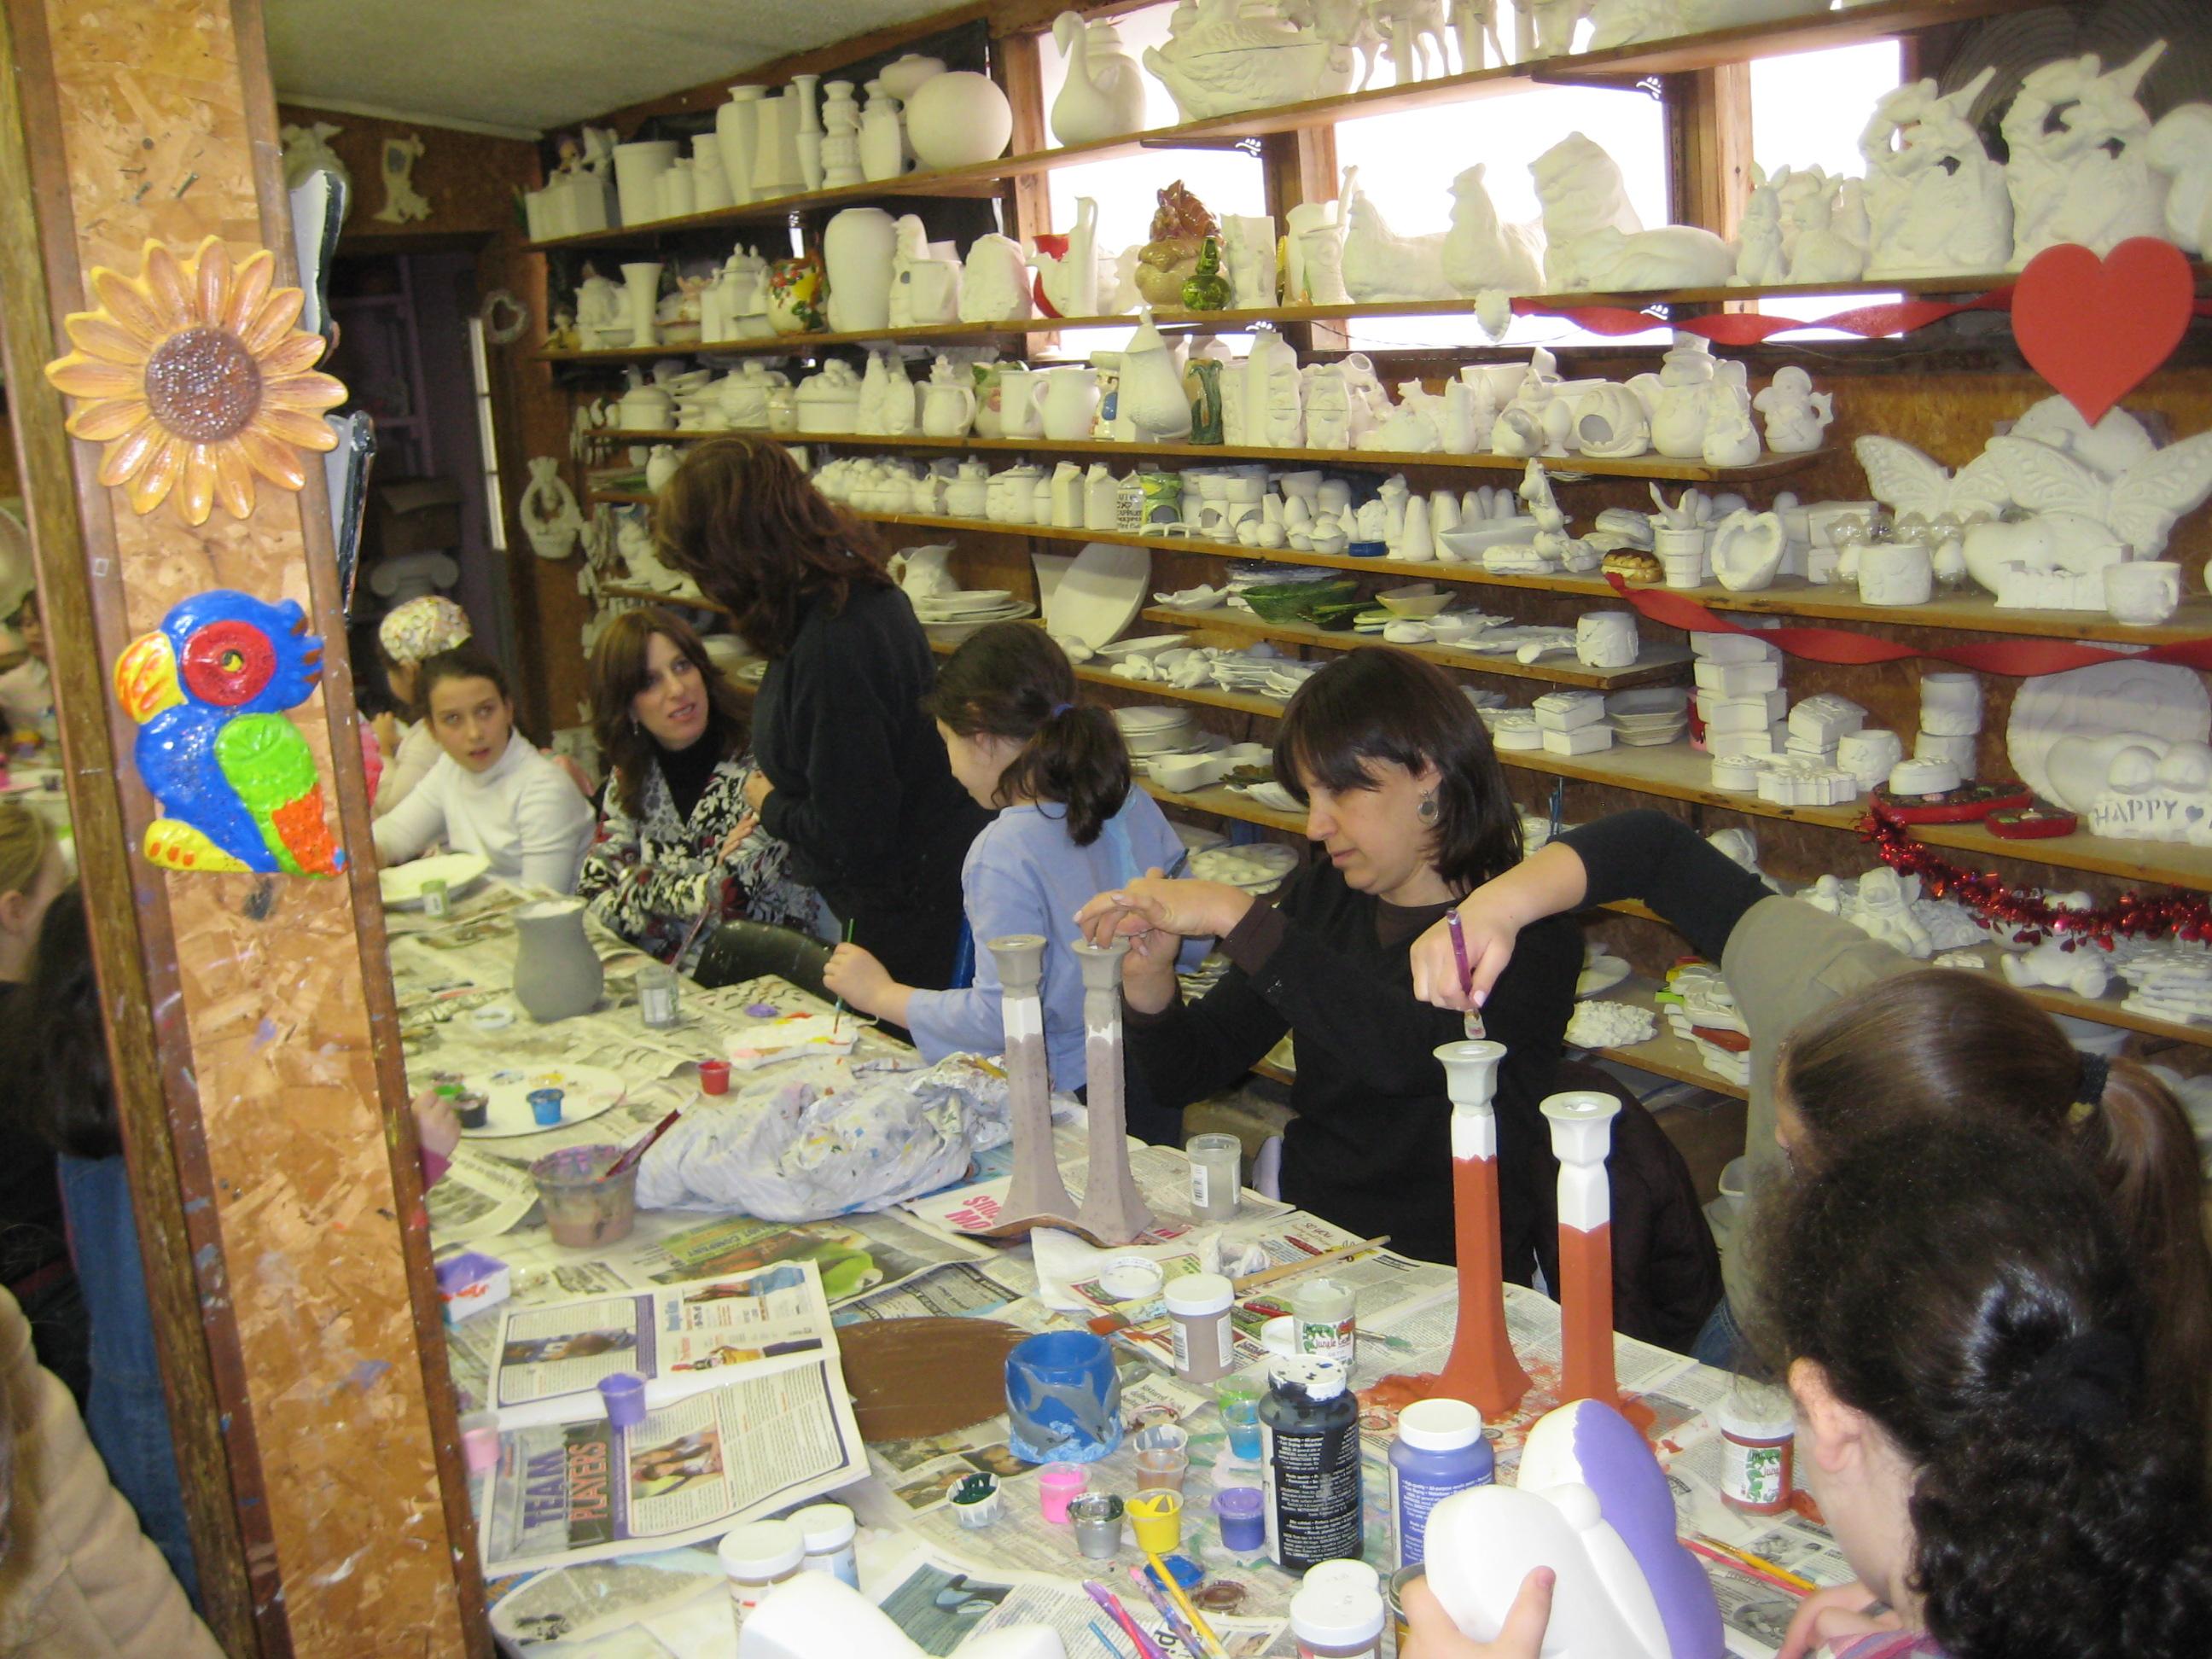 Jill's Ceramics